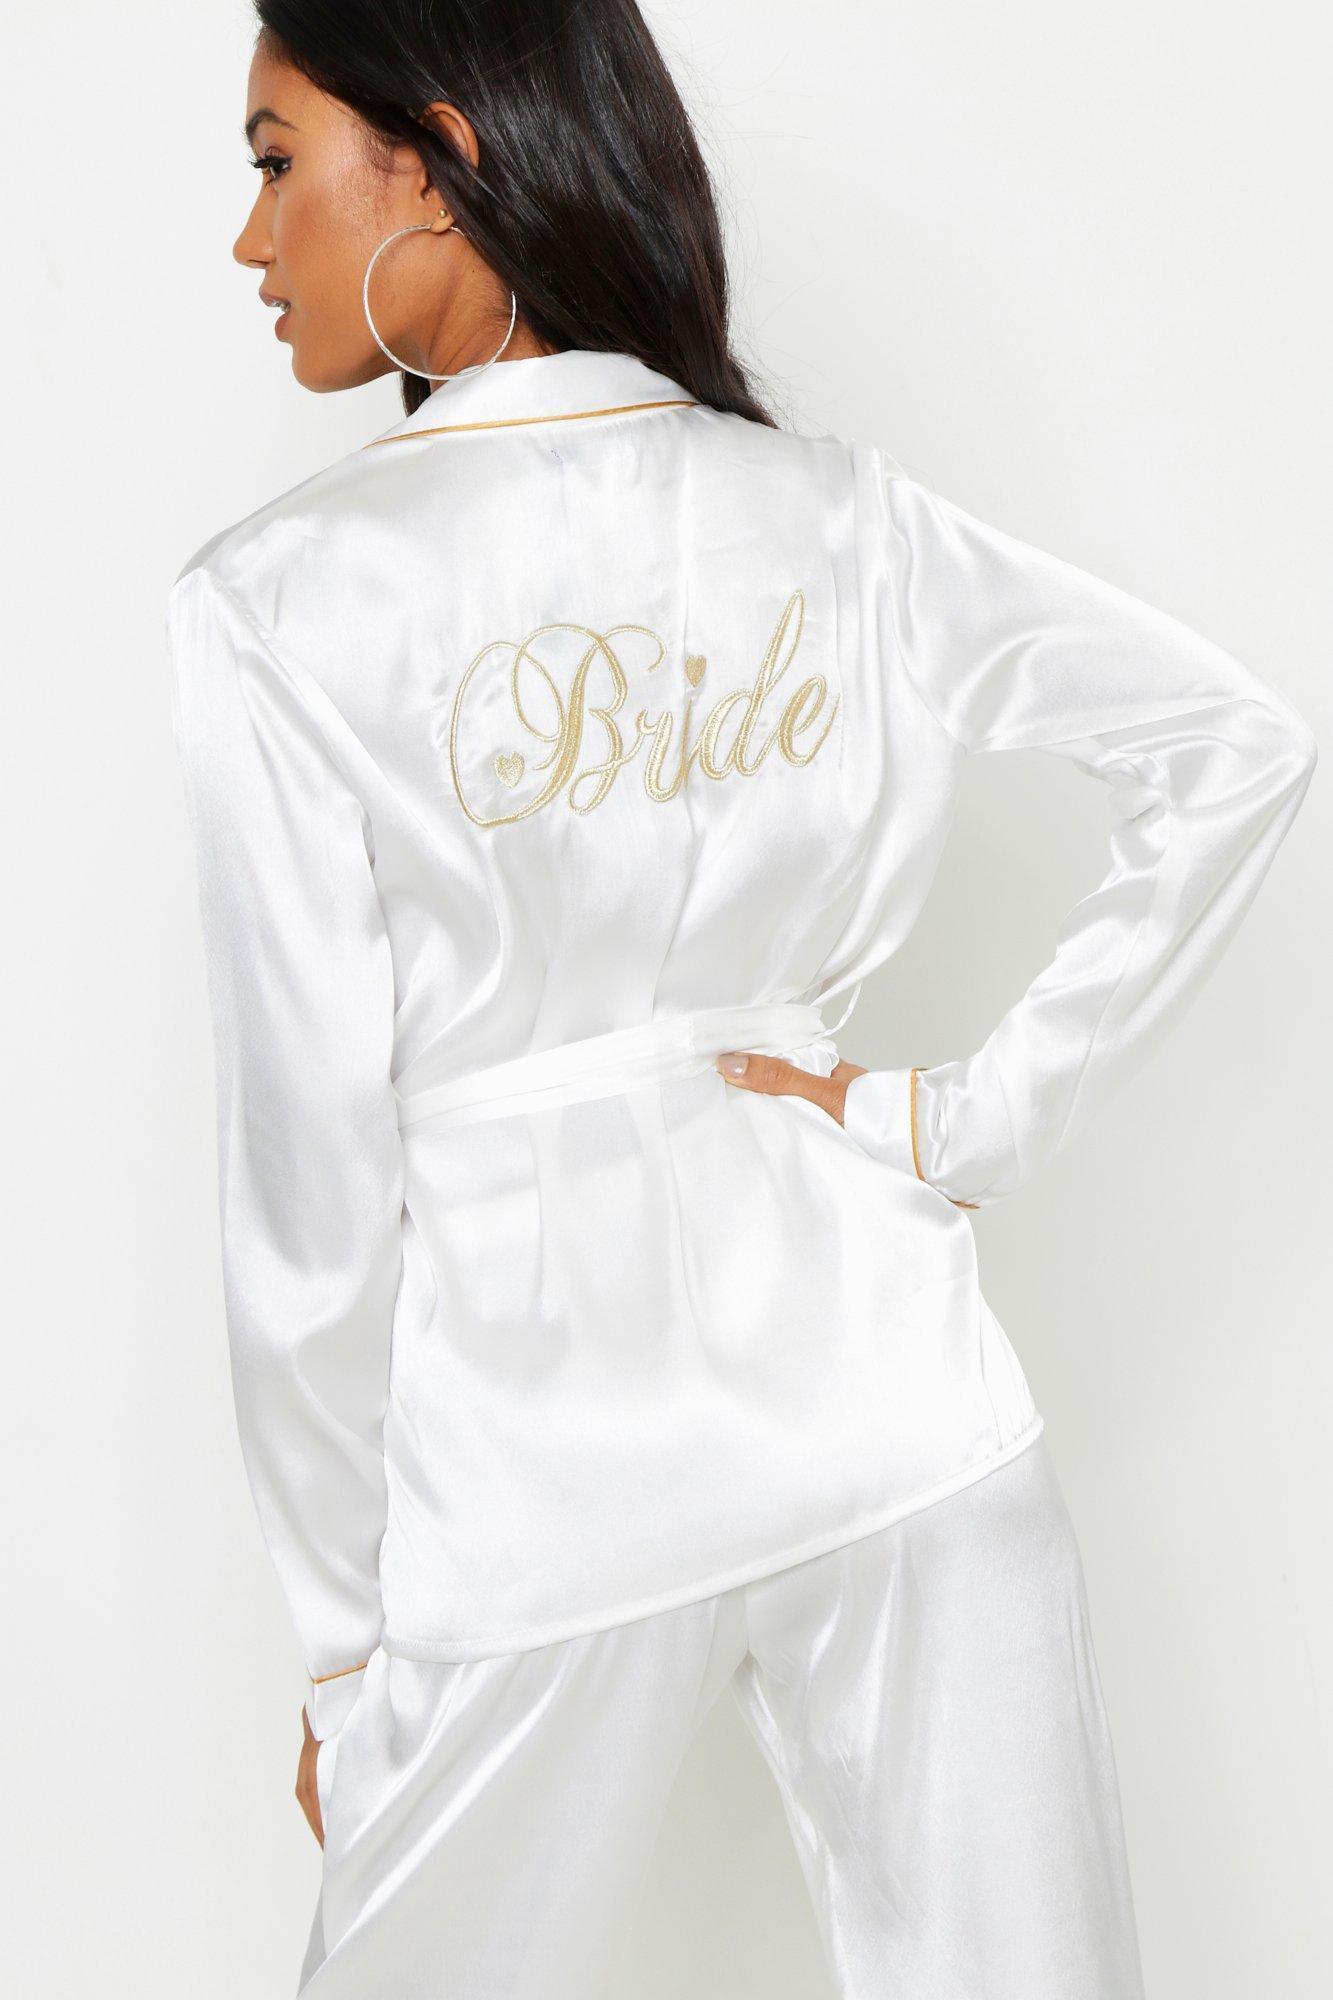 7149ec78ca6 Boohoo Bride Wrap Front Pj Set in White - Lyst